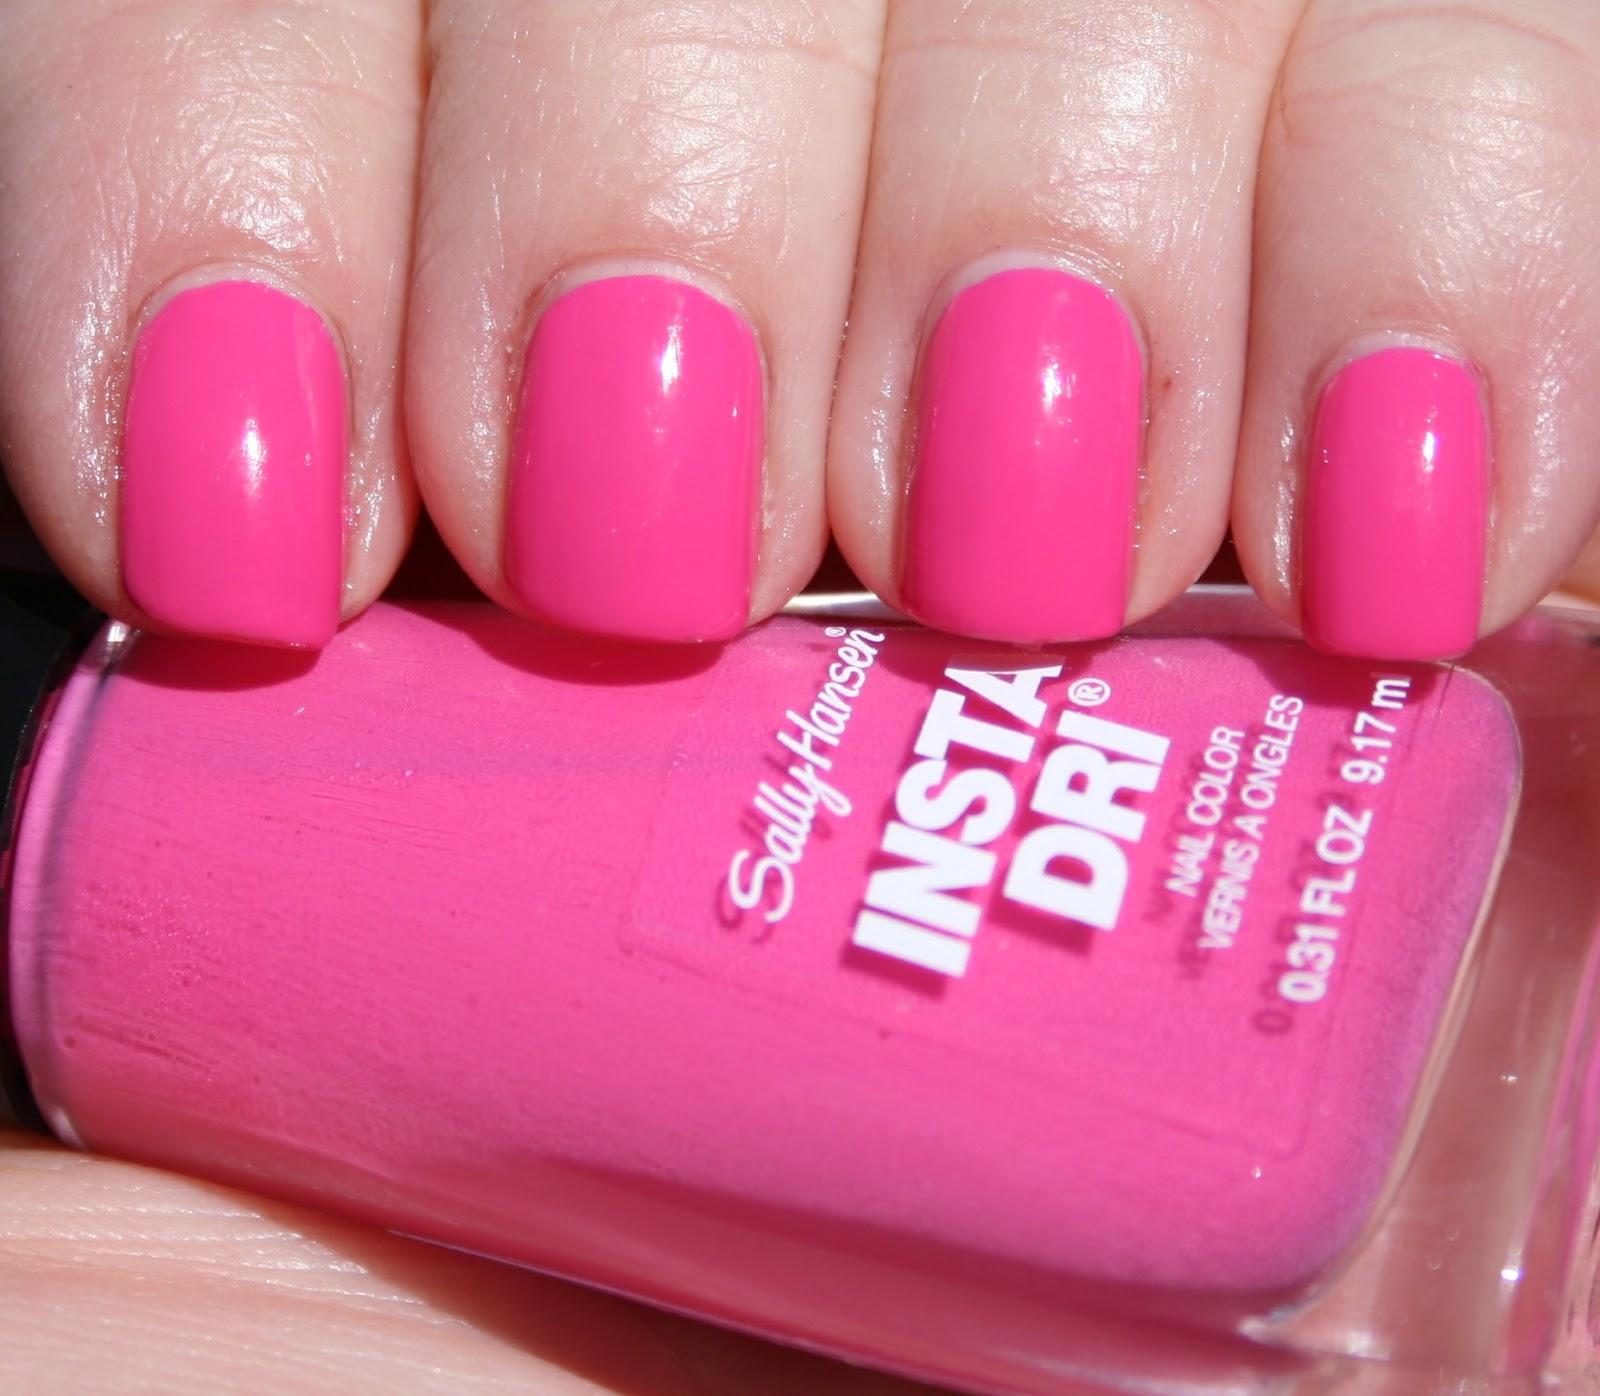 Sasha Says Nails... I'm a Manicure Momma: Sally Hansen Insta-Dri in Peppy  Le Fuchsia